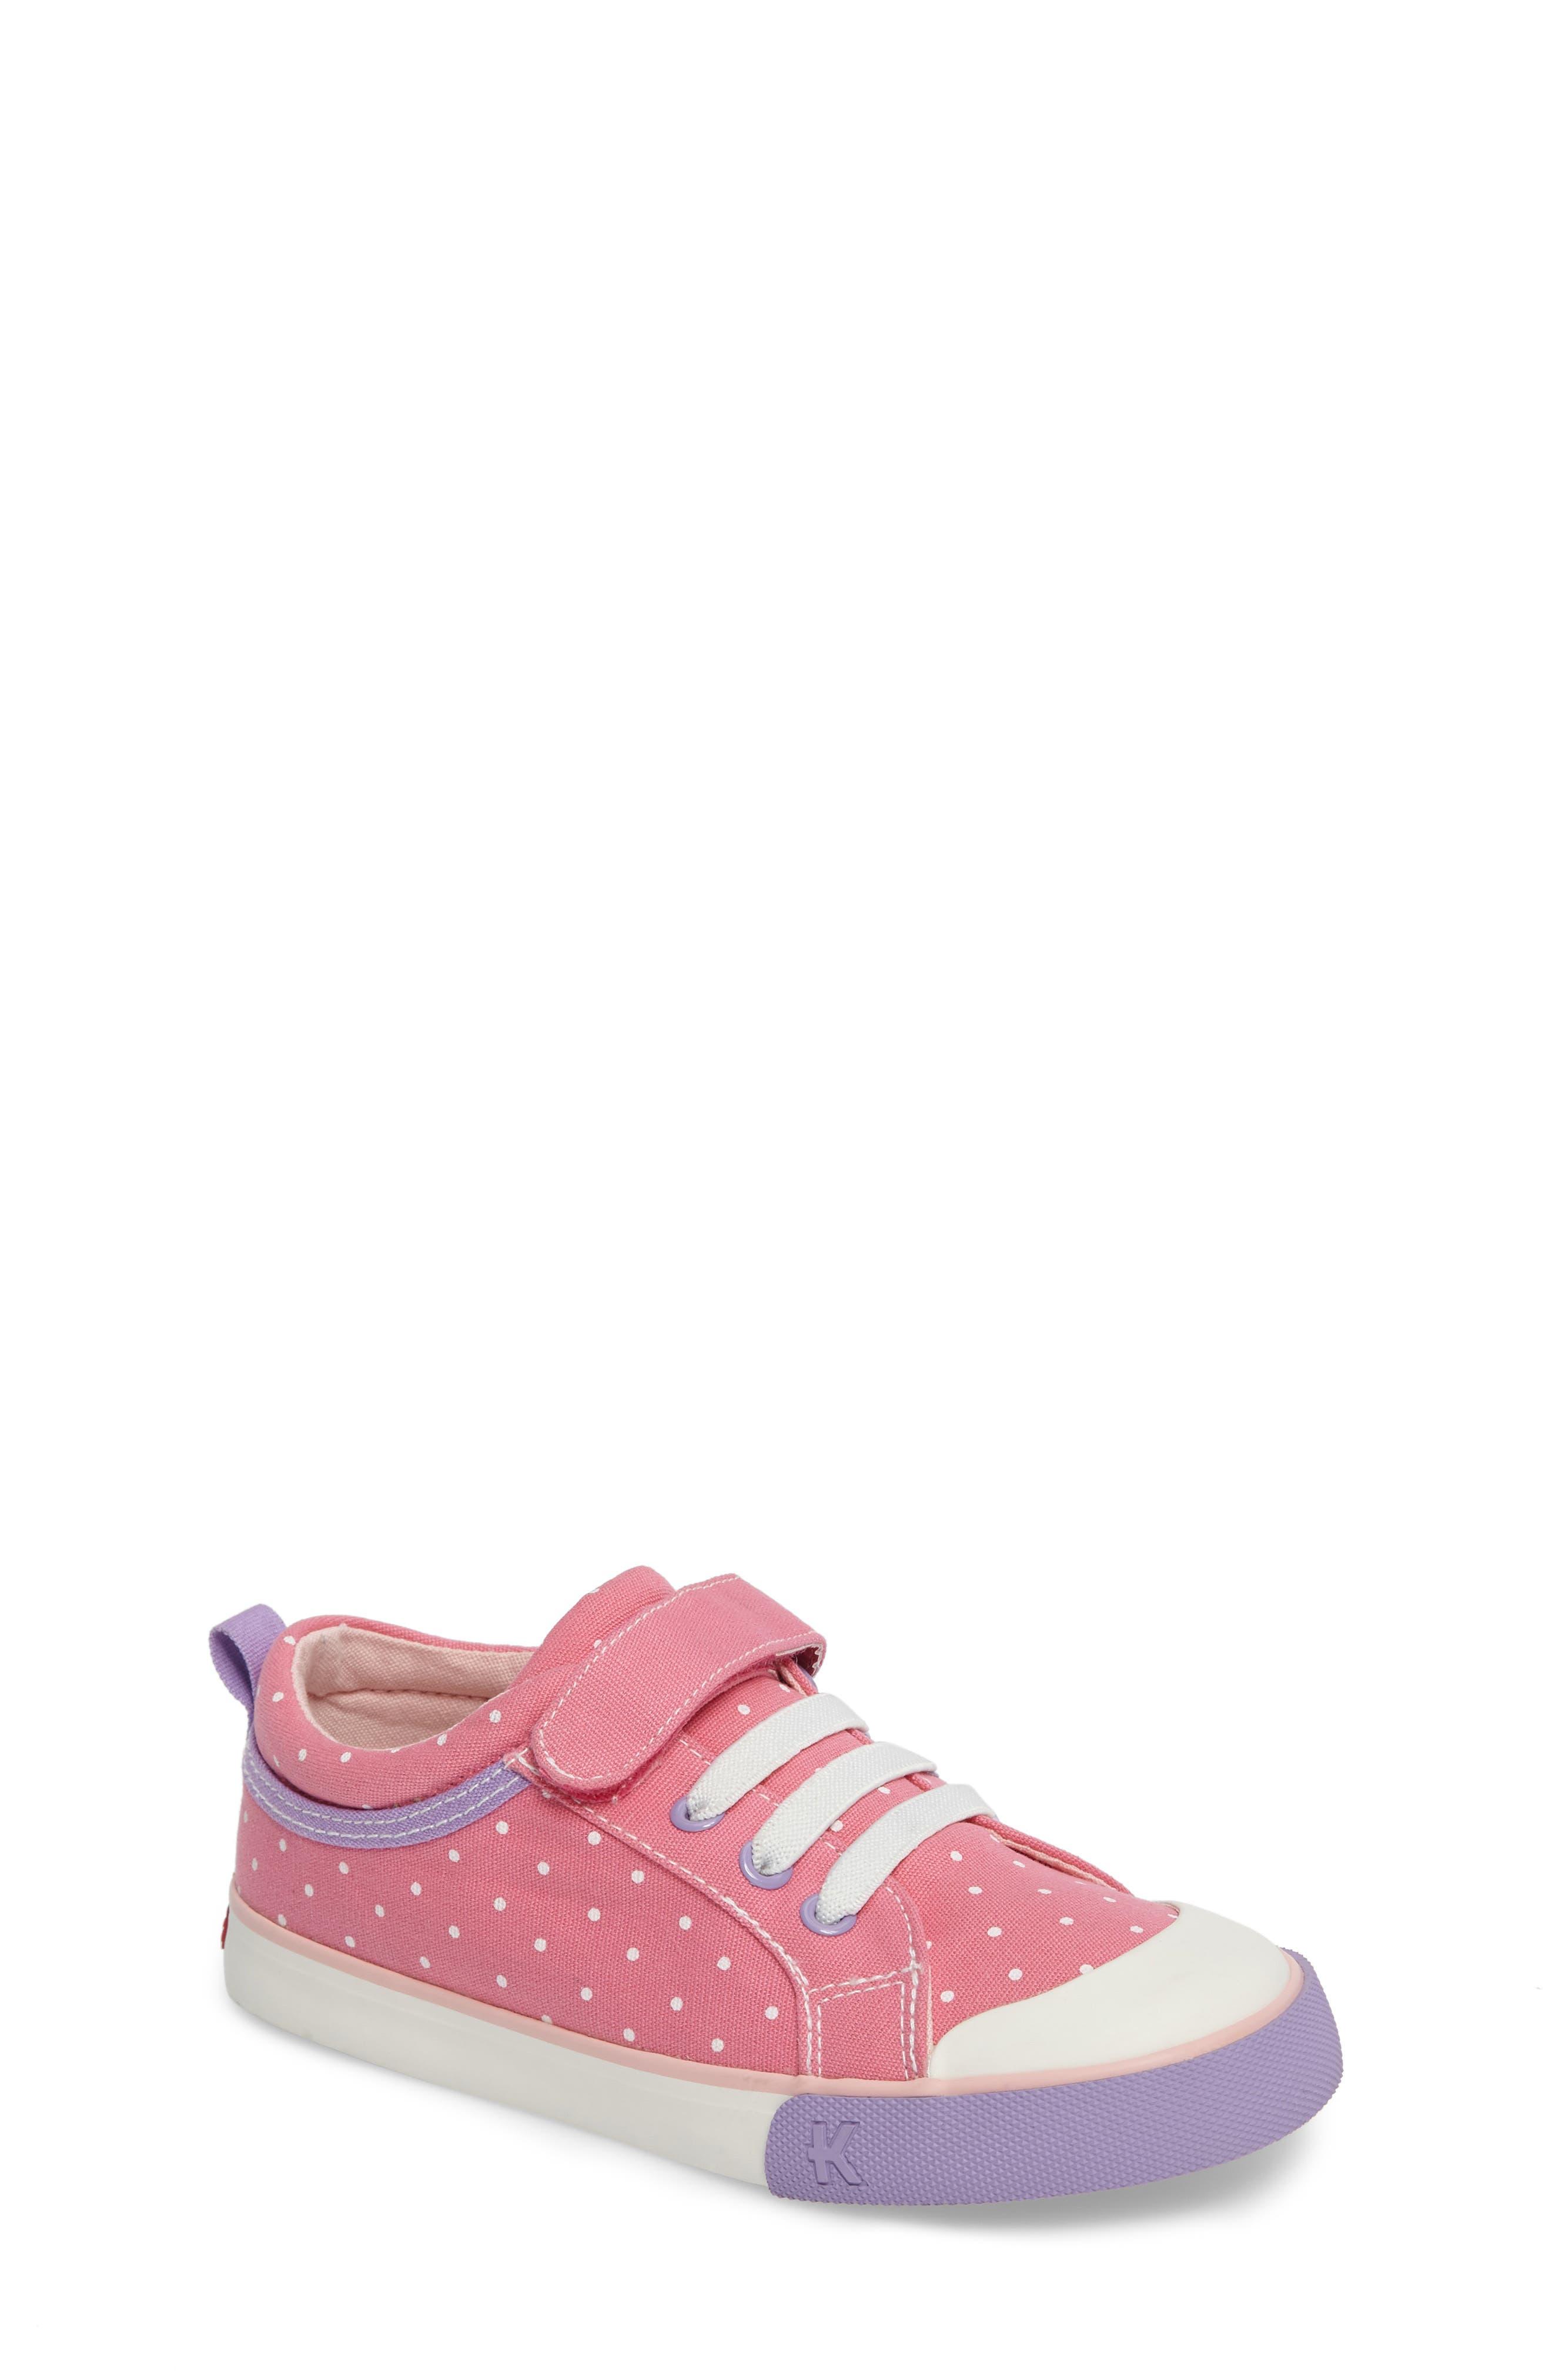 See Kai Run 'Kristin' Sneaker (Toddler & Little Kid)